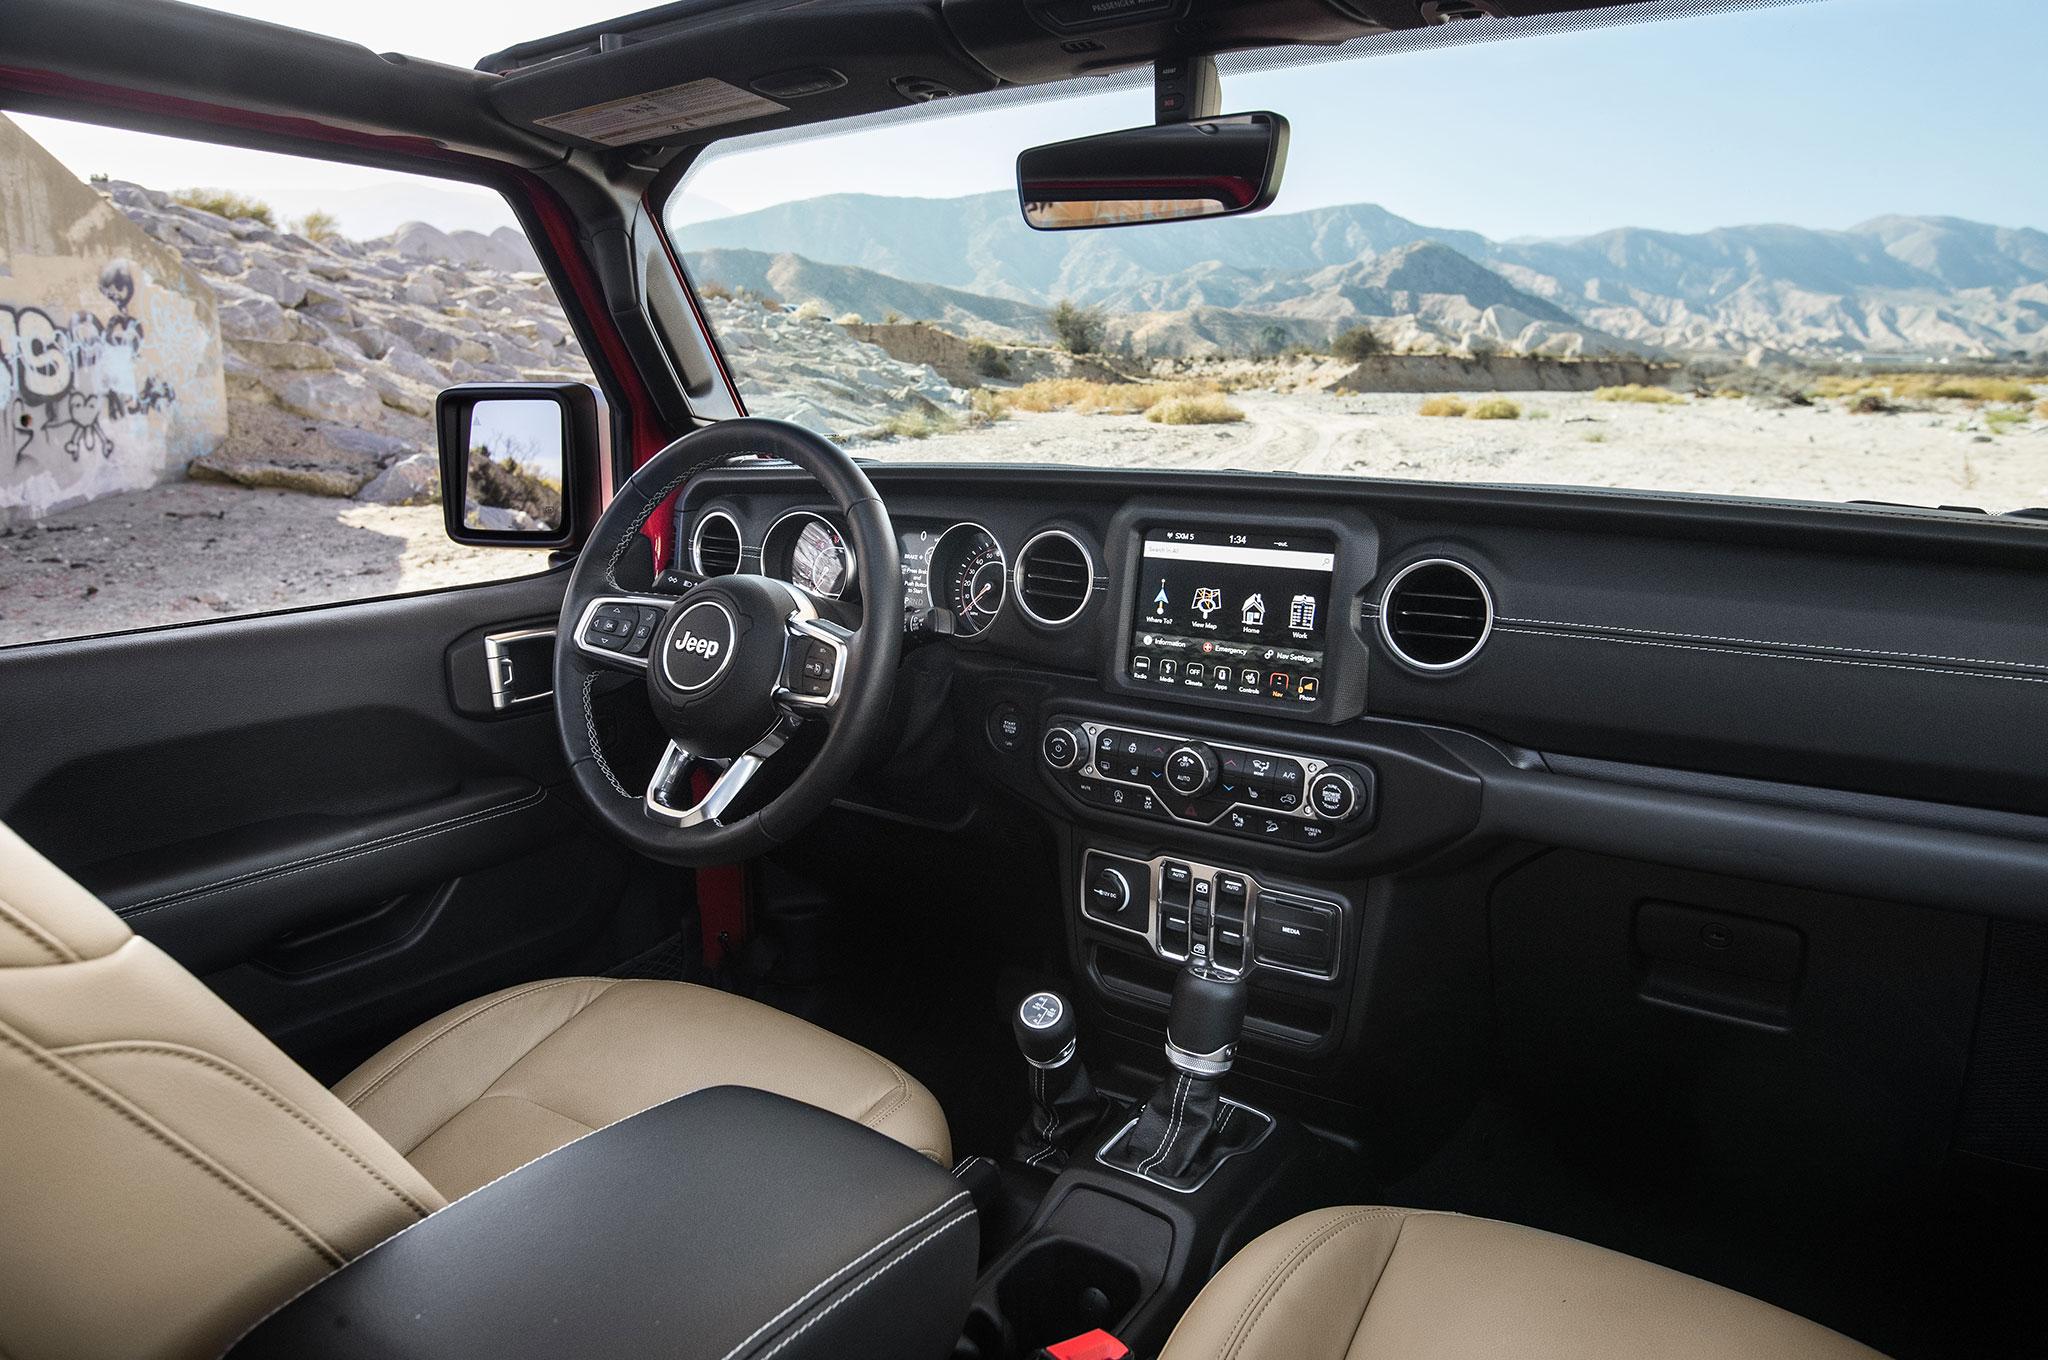 Jeep Wrangler Interior >> 2018 Jeep Wrangler Sahara Unlimited Interior From Passenger Seat